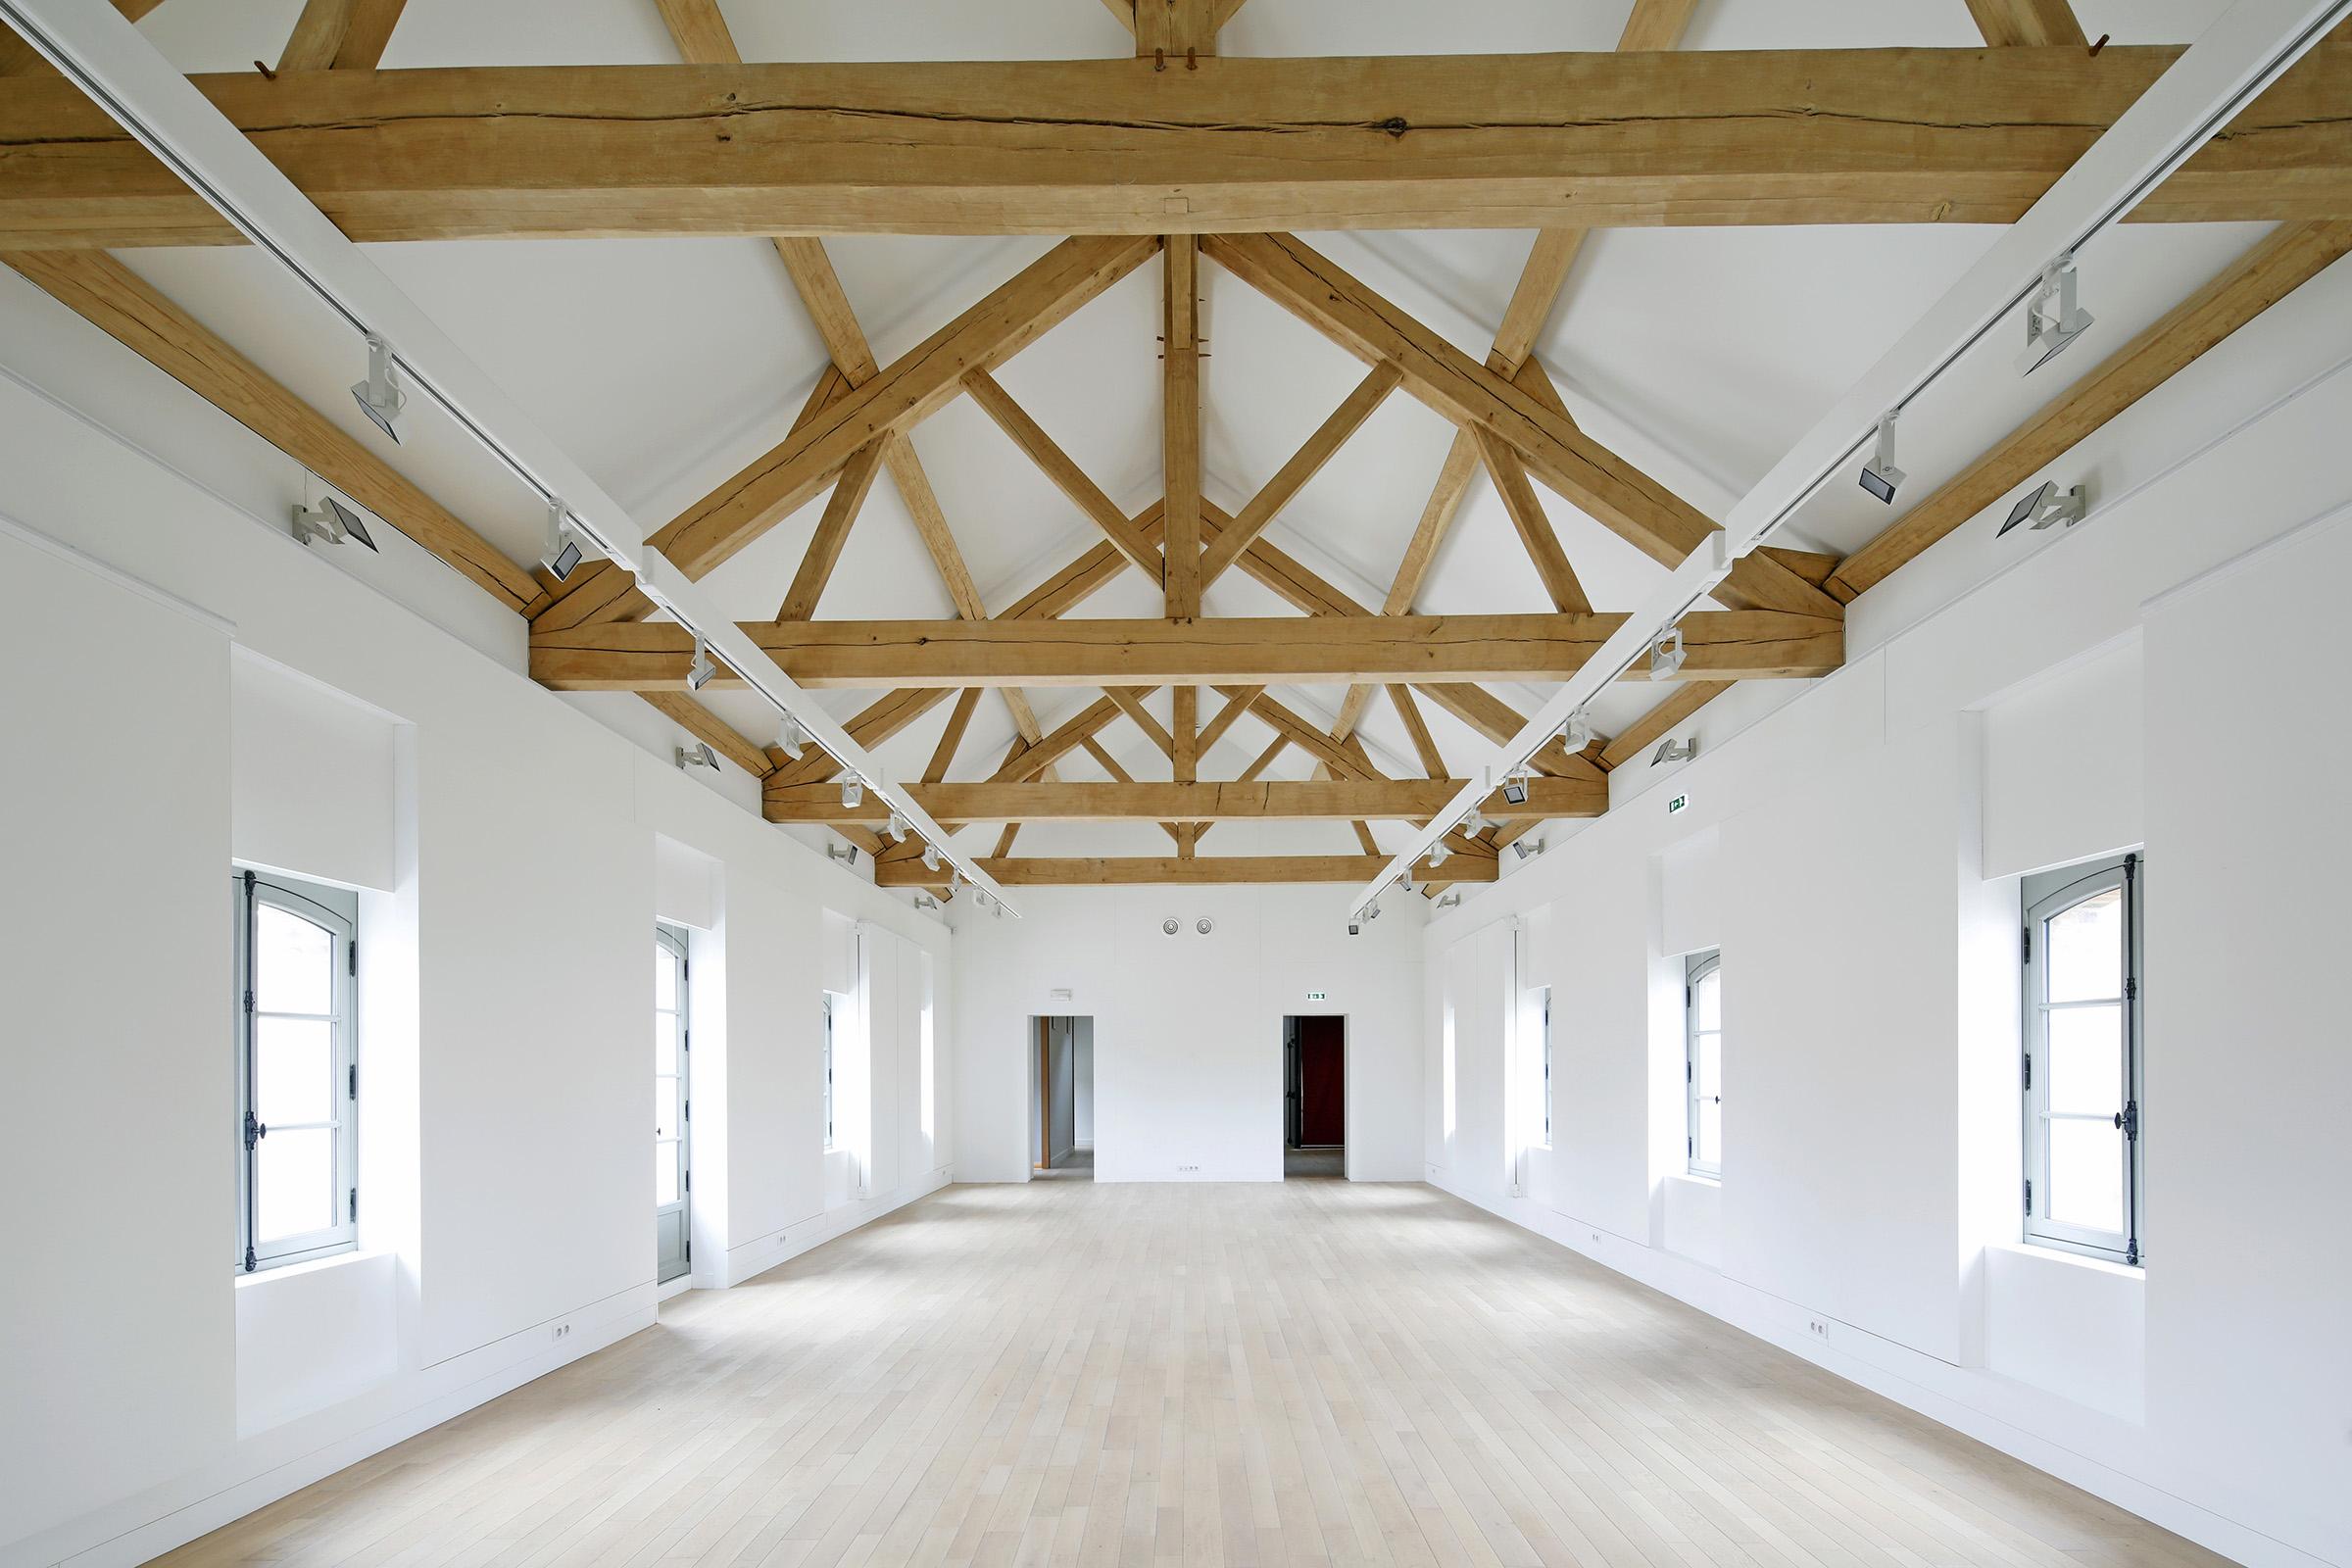 Amilly - La Maison Saint Loup - Interieur - Sylvain Dubuisson 032.jpg